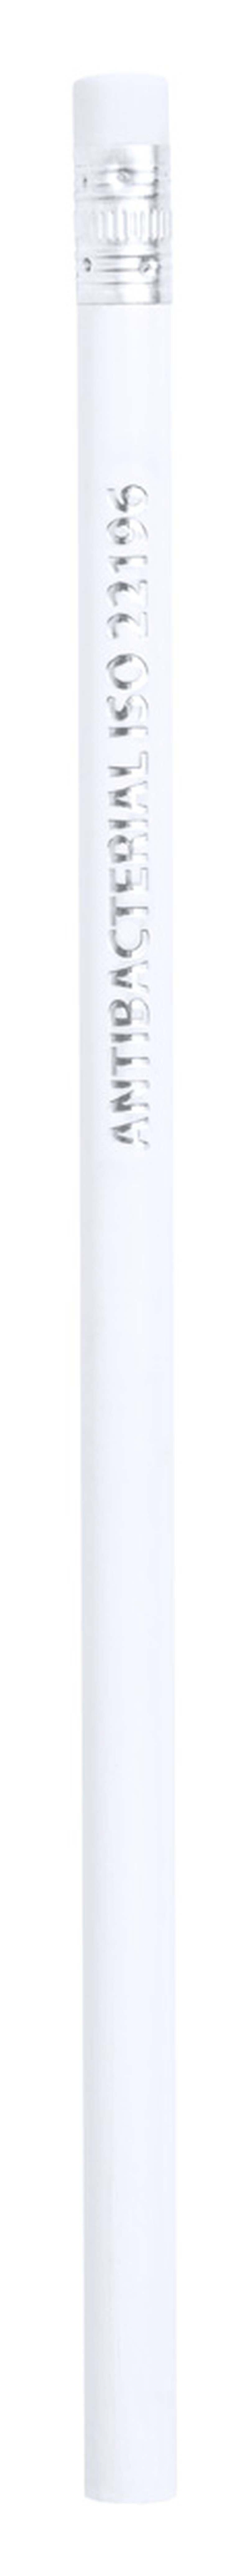 Antibakteriální tužka Sukon